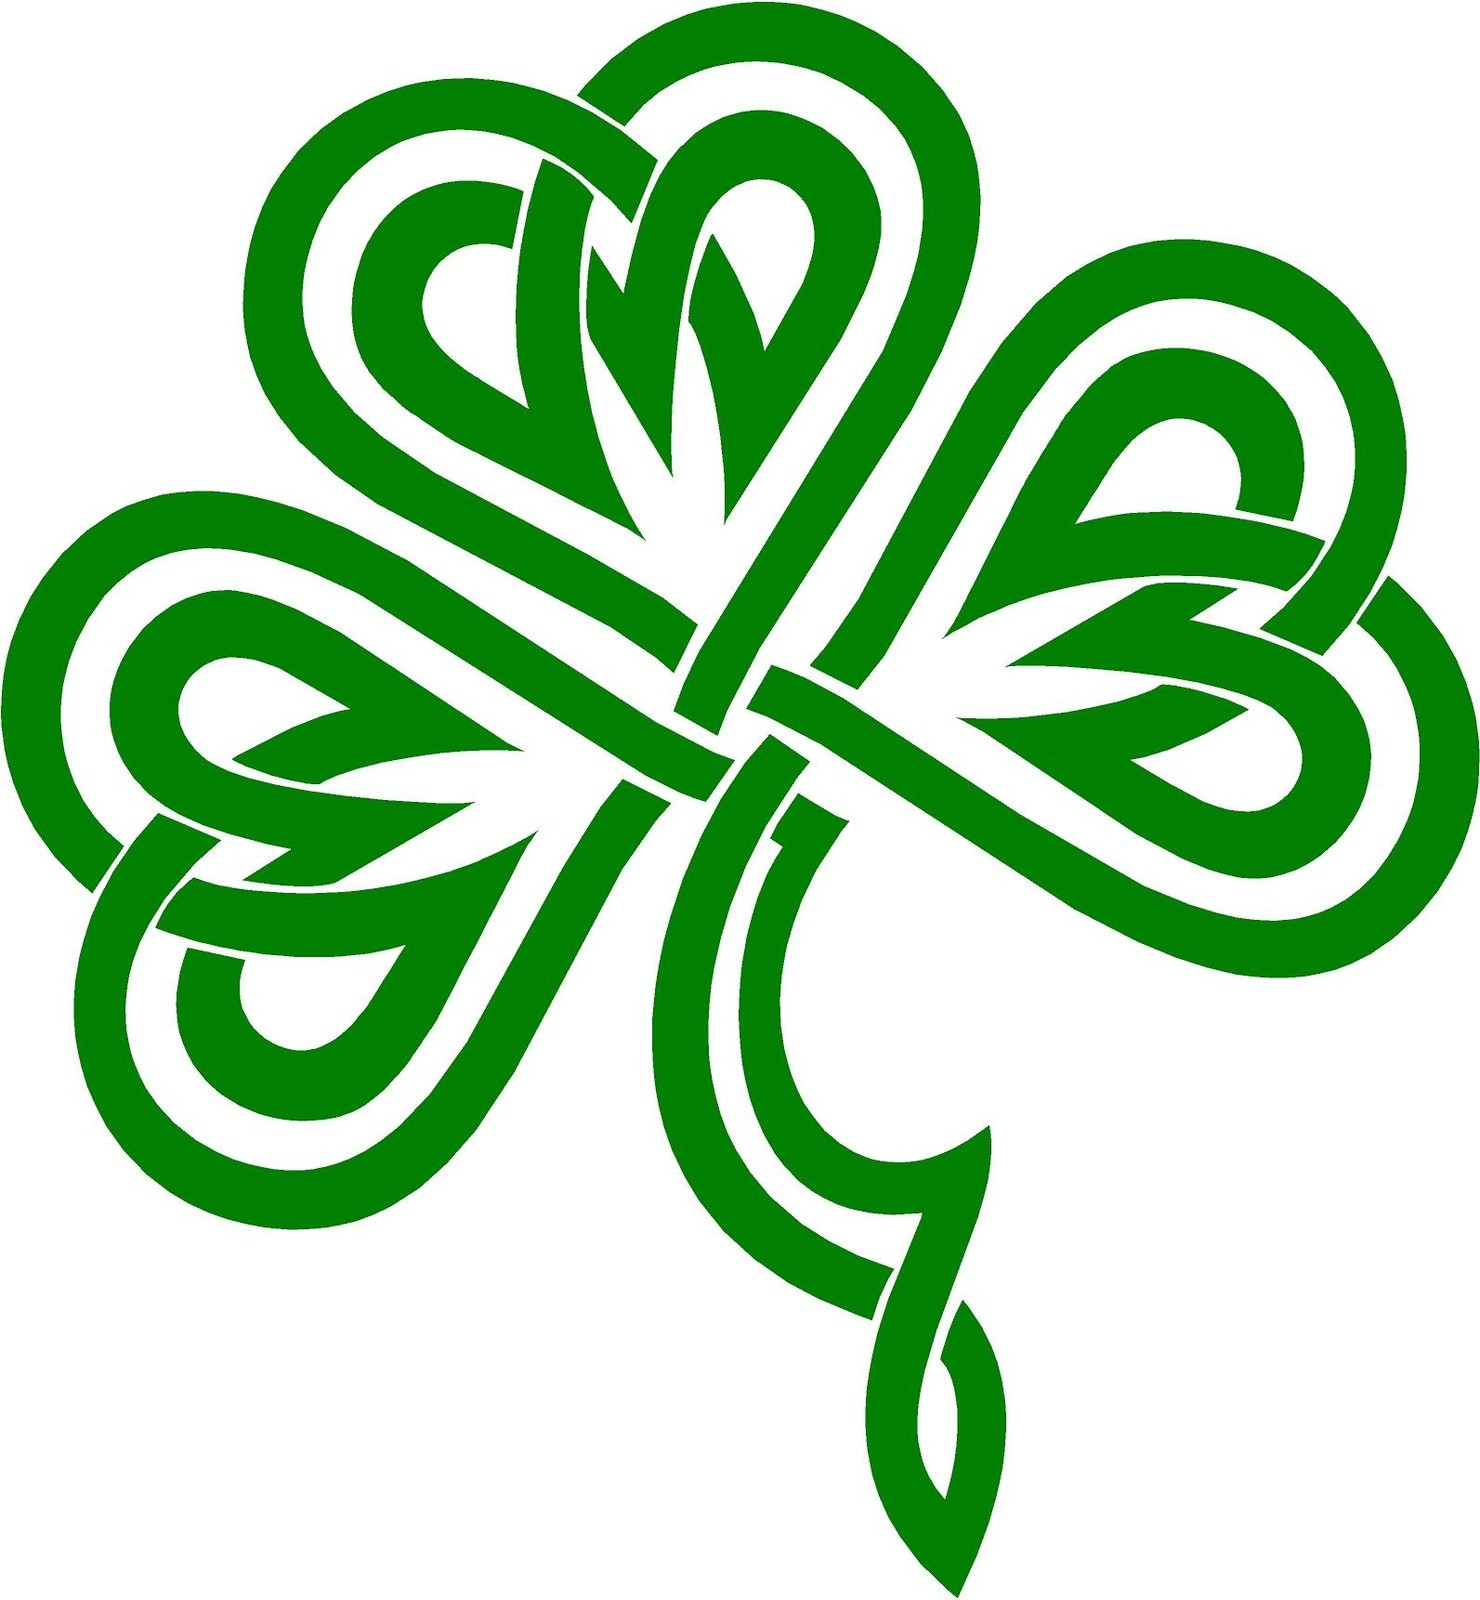 Celtic Shamrock Clipart - Clipart Kid